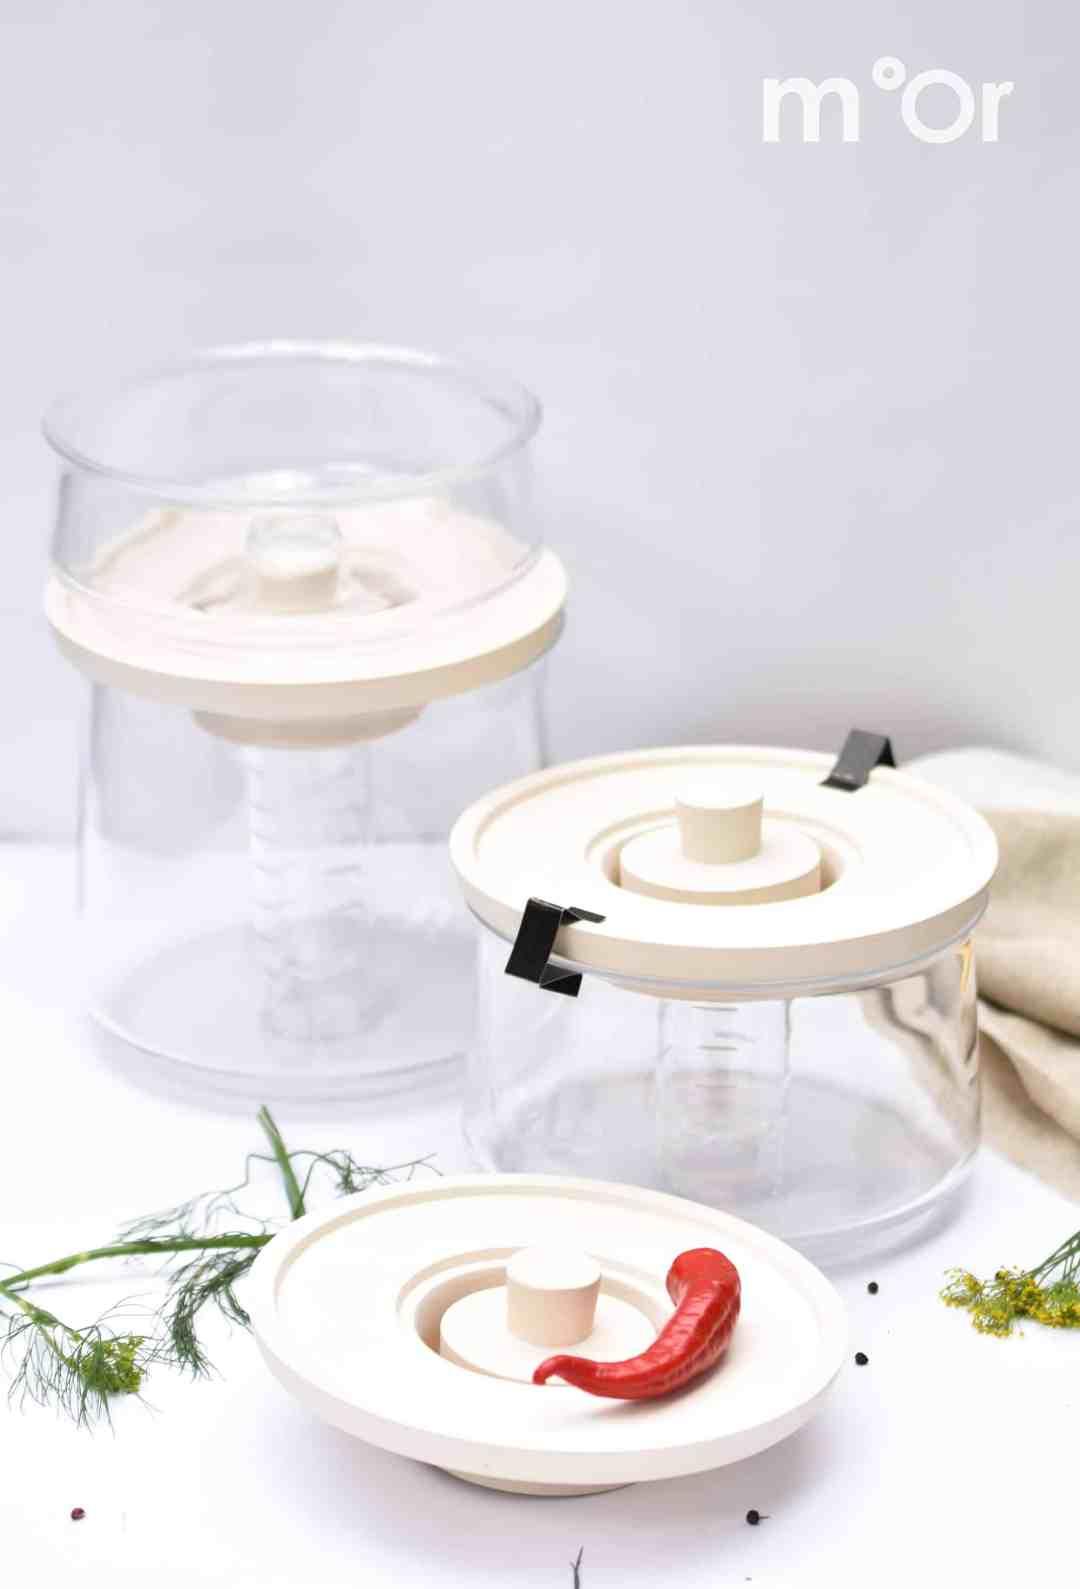 M°Or, Homemade Fermentation Set by Katarzyna Wasilewska